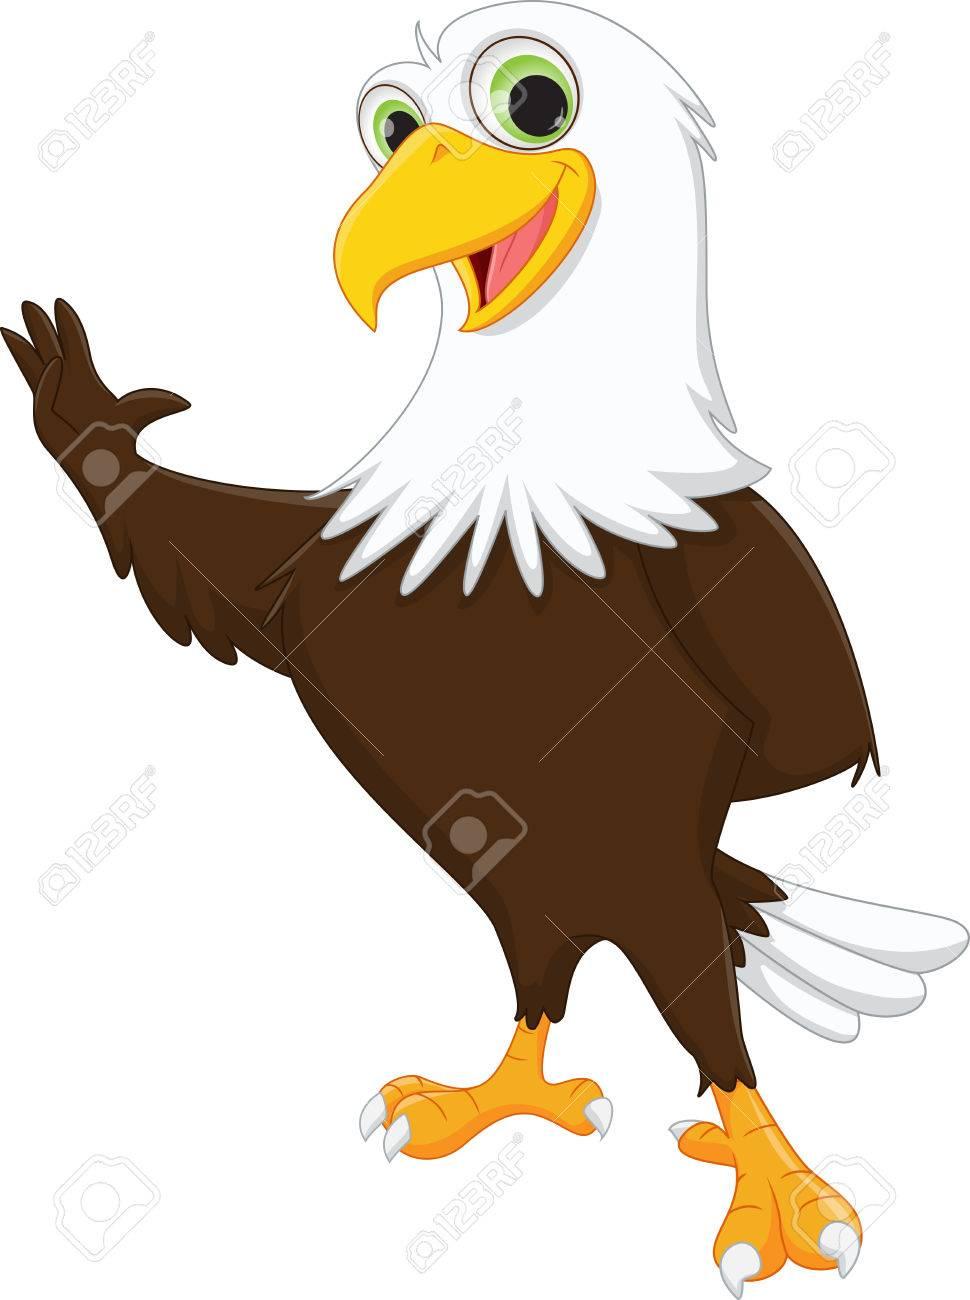 cute eagle cartoon waving hand royalty free cliparts vectors and rh 123rf com baby eagle cartoon images eagle cartoon pictures free